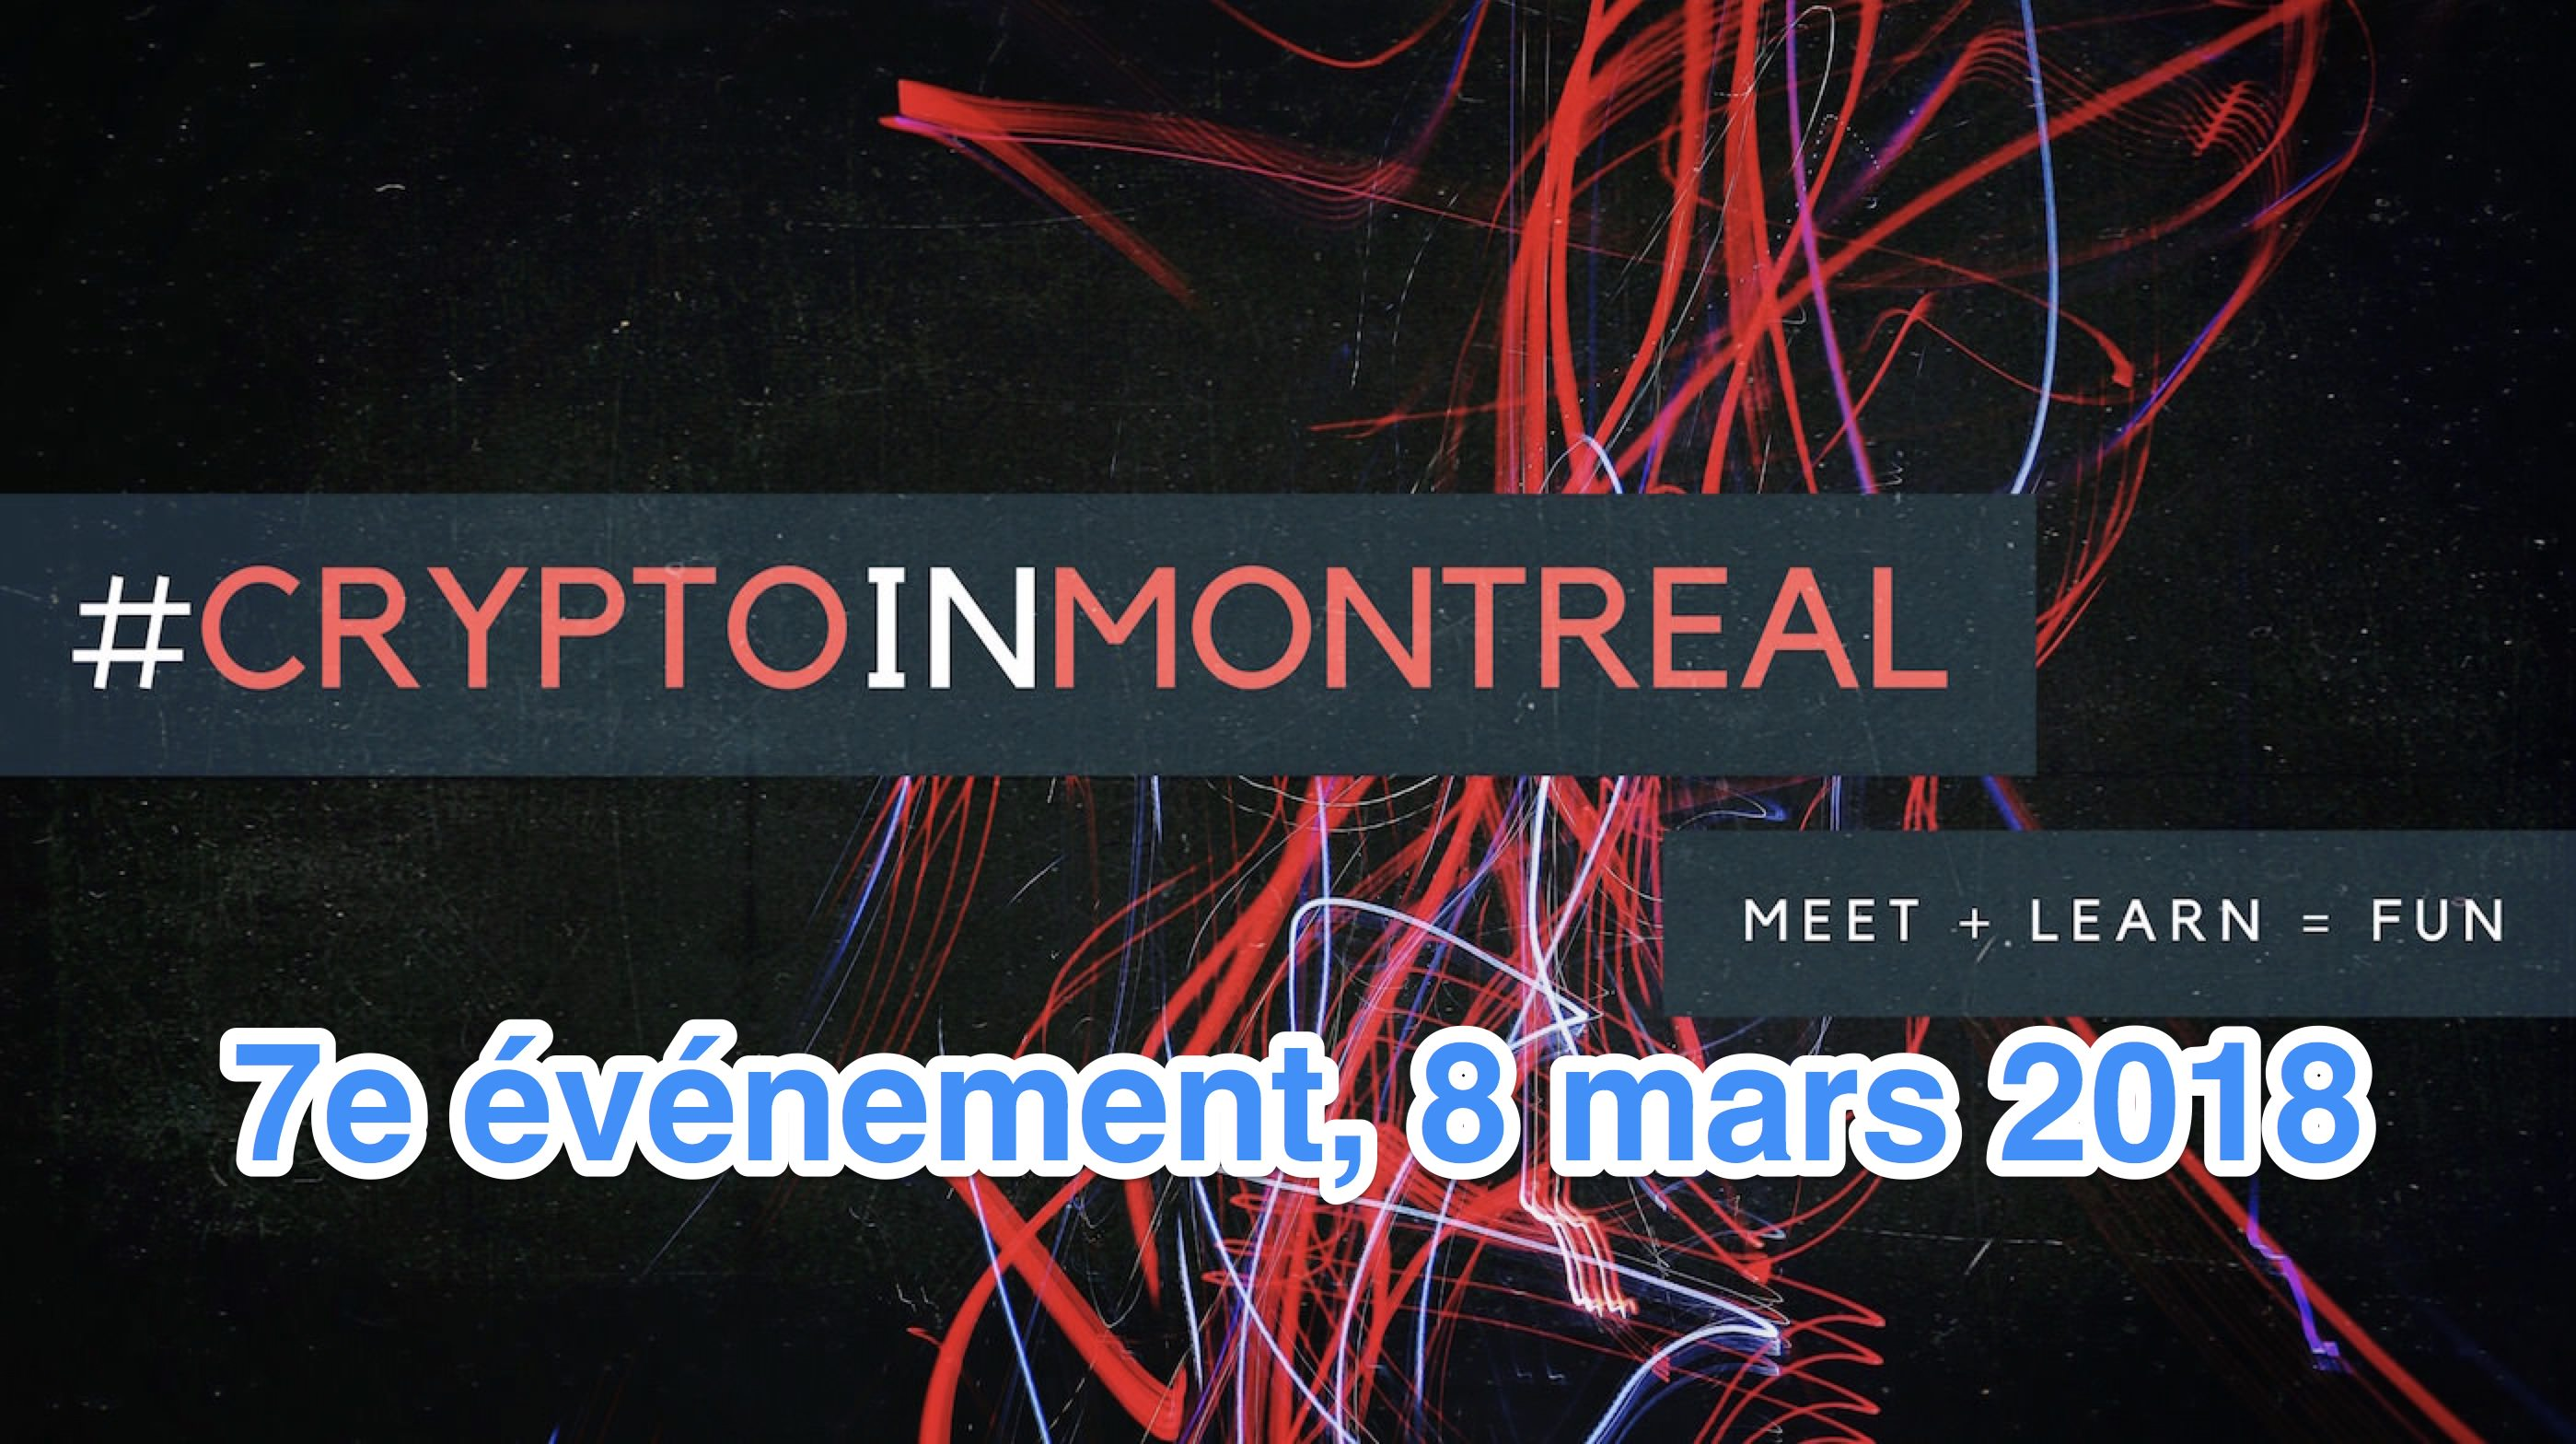 Blockchain et cryptomonnaies | La 7e édition de #CryptoInMontreal